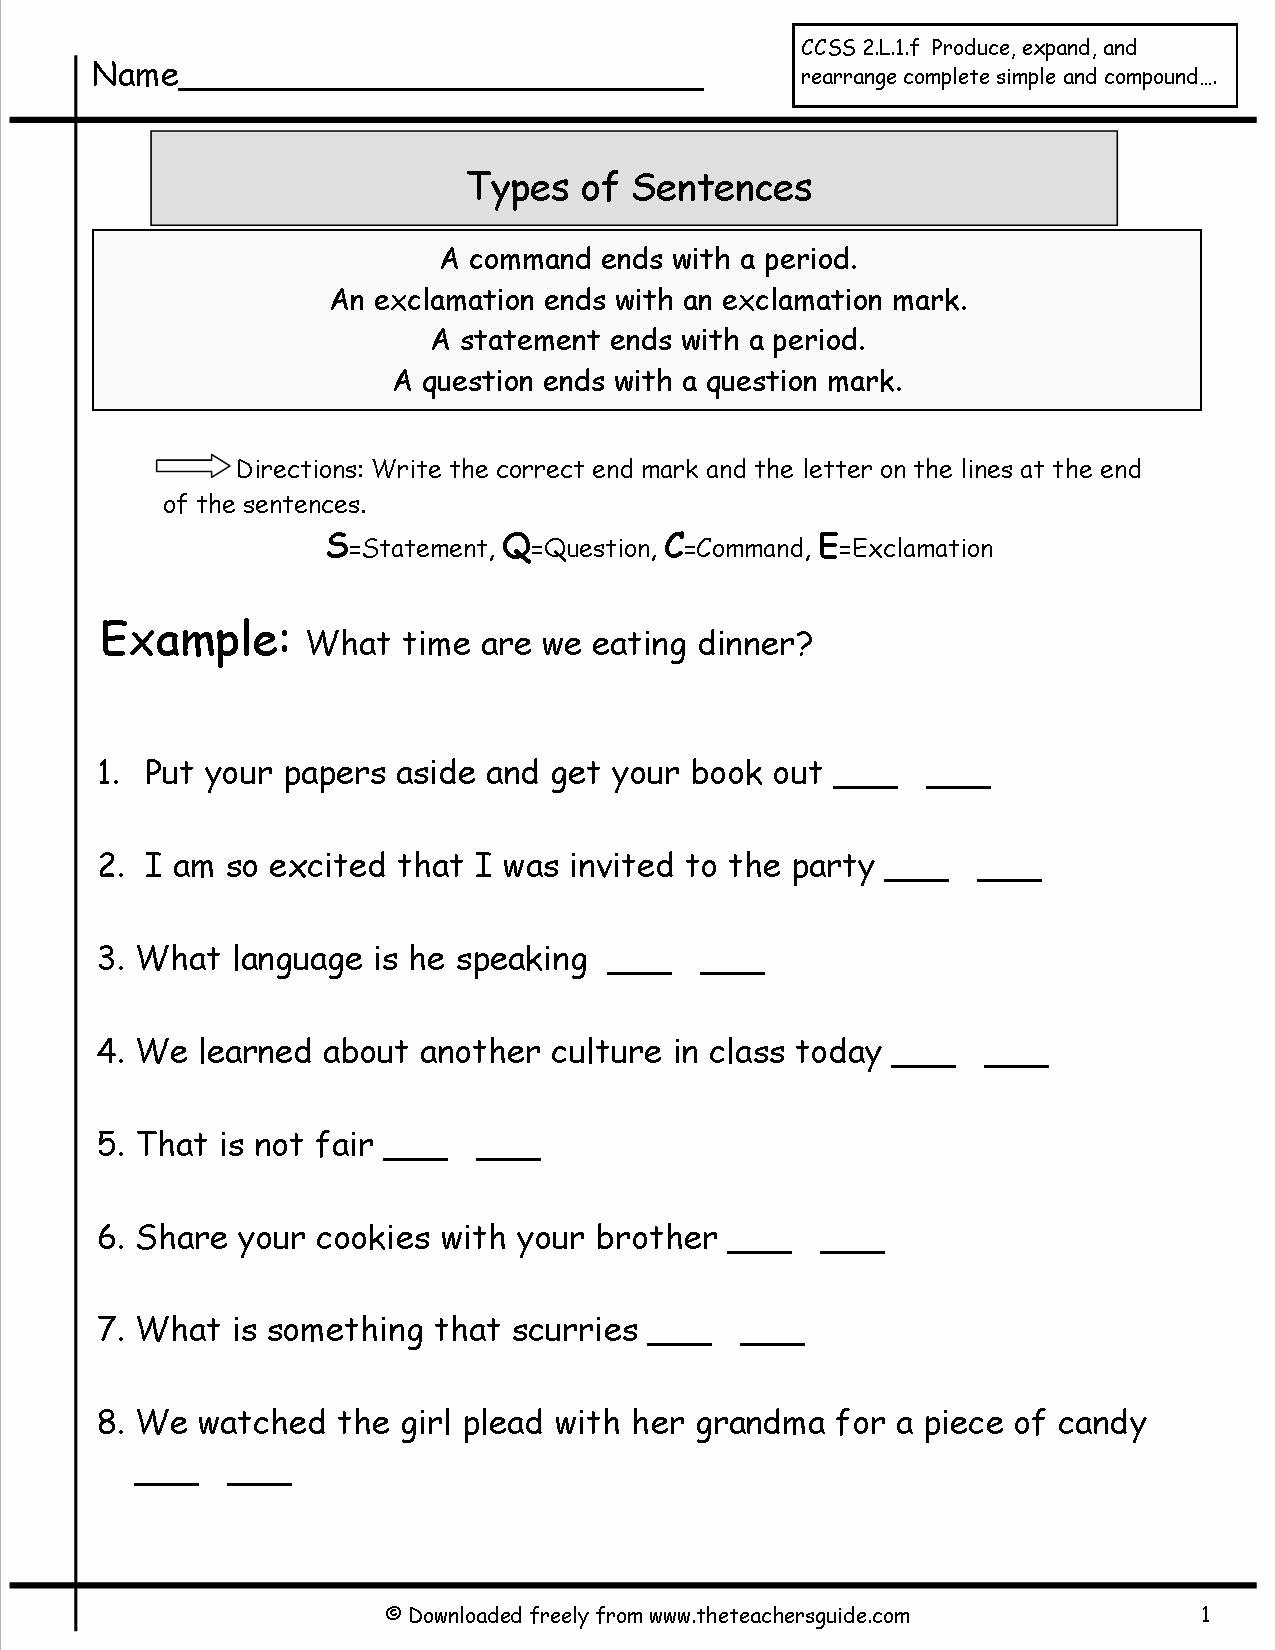 Combining Sentences Worksheets 5th Grade Best Of 20 Bining Sentences Worksheets 5th Grade